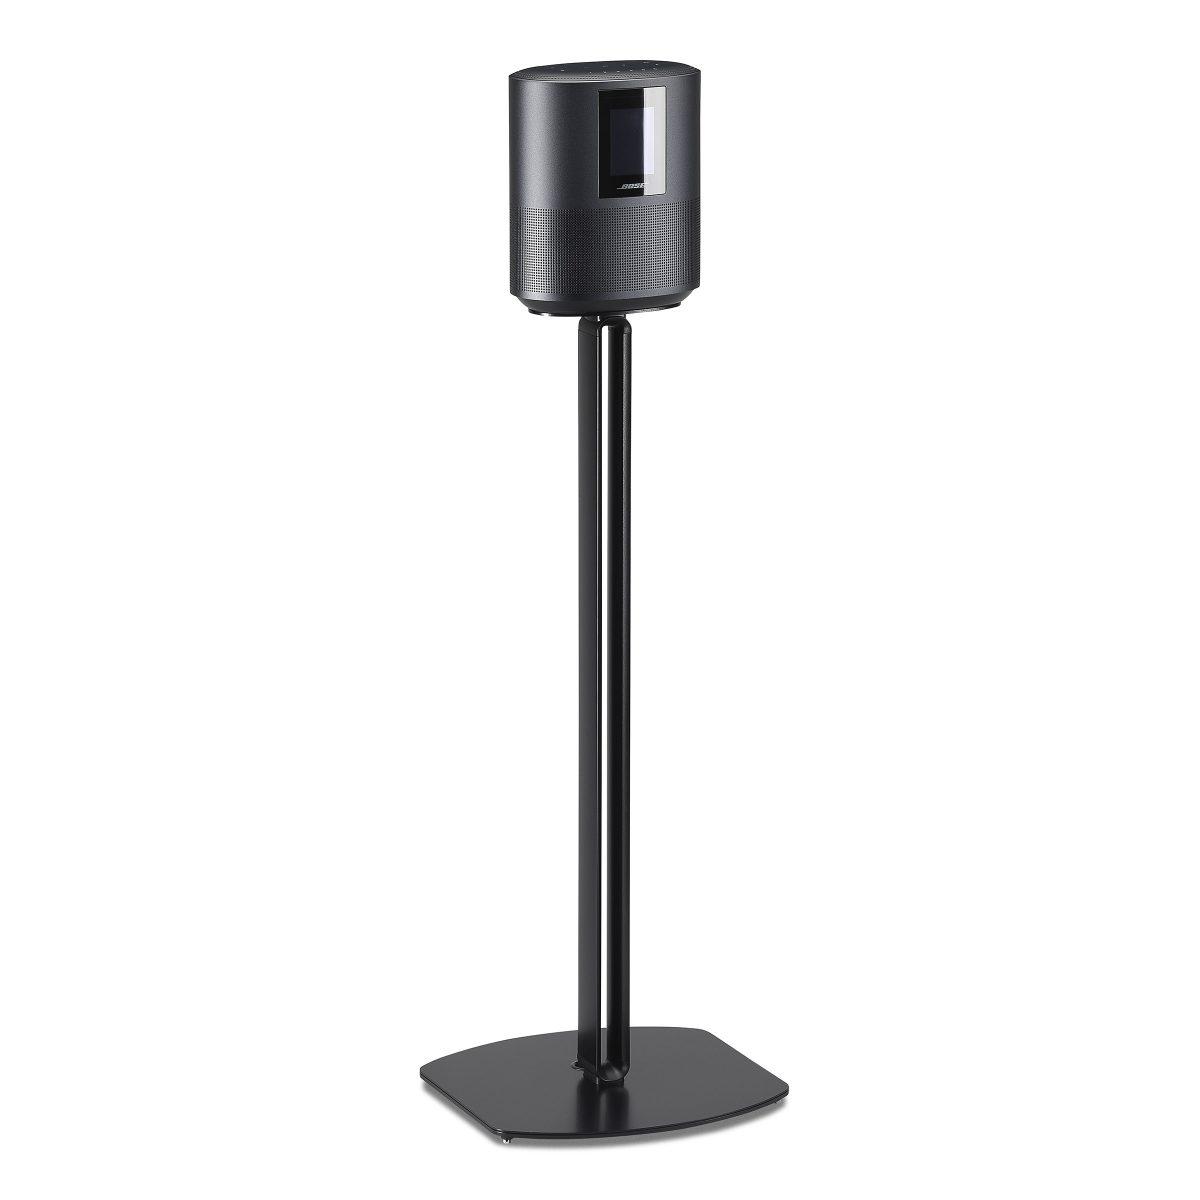 Bose Home Speaker 500 standaard zwart 5